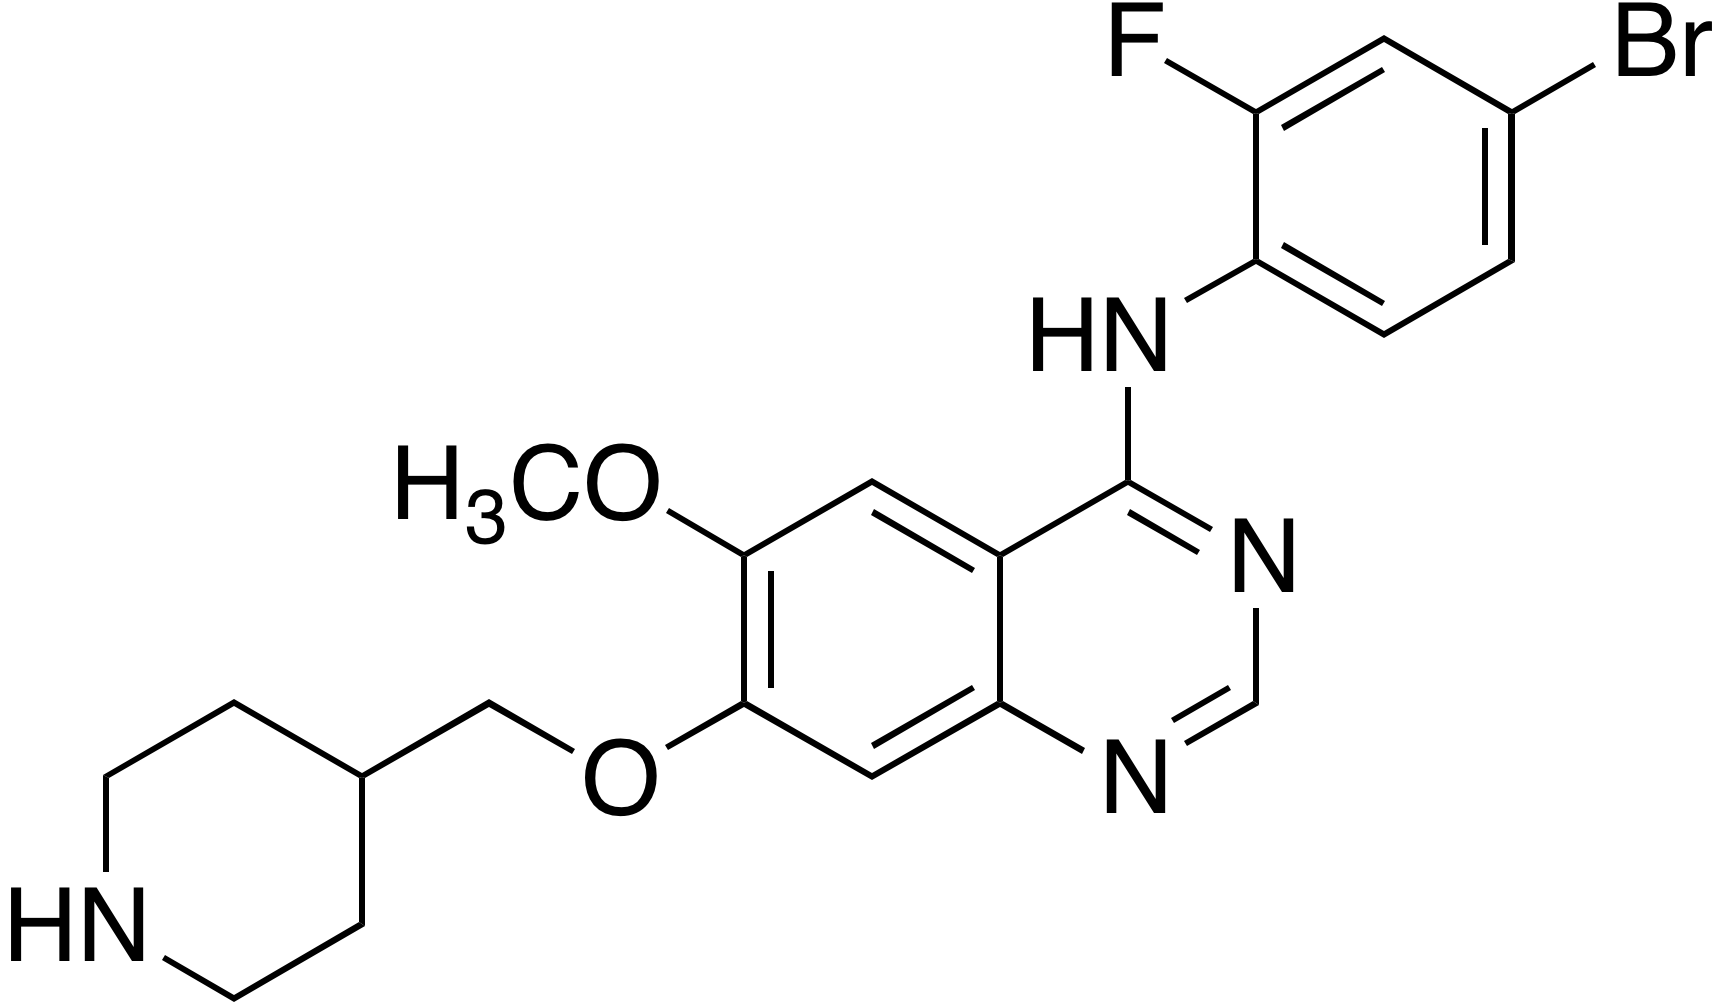 N-Demethyl Vandetanib